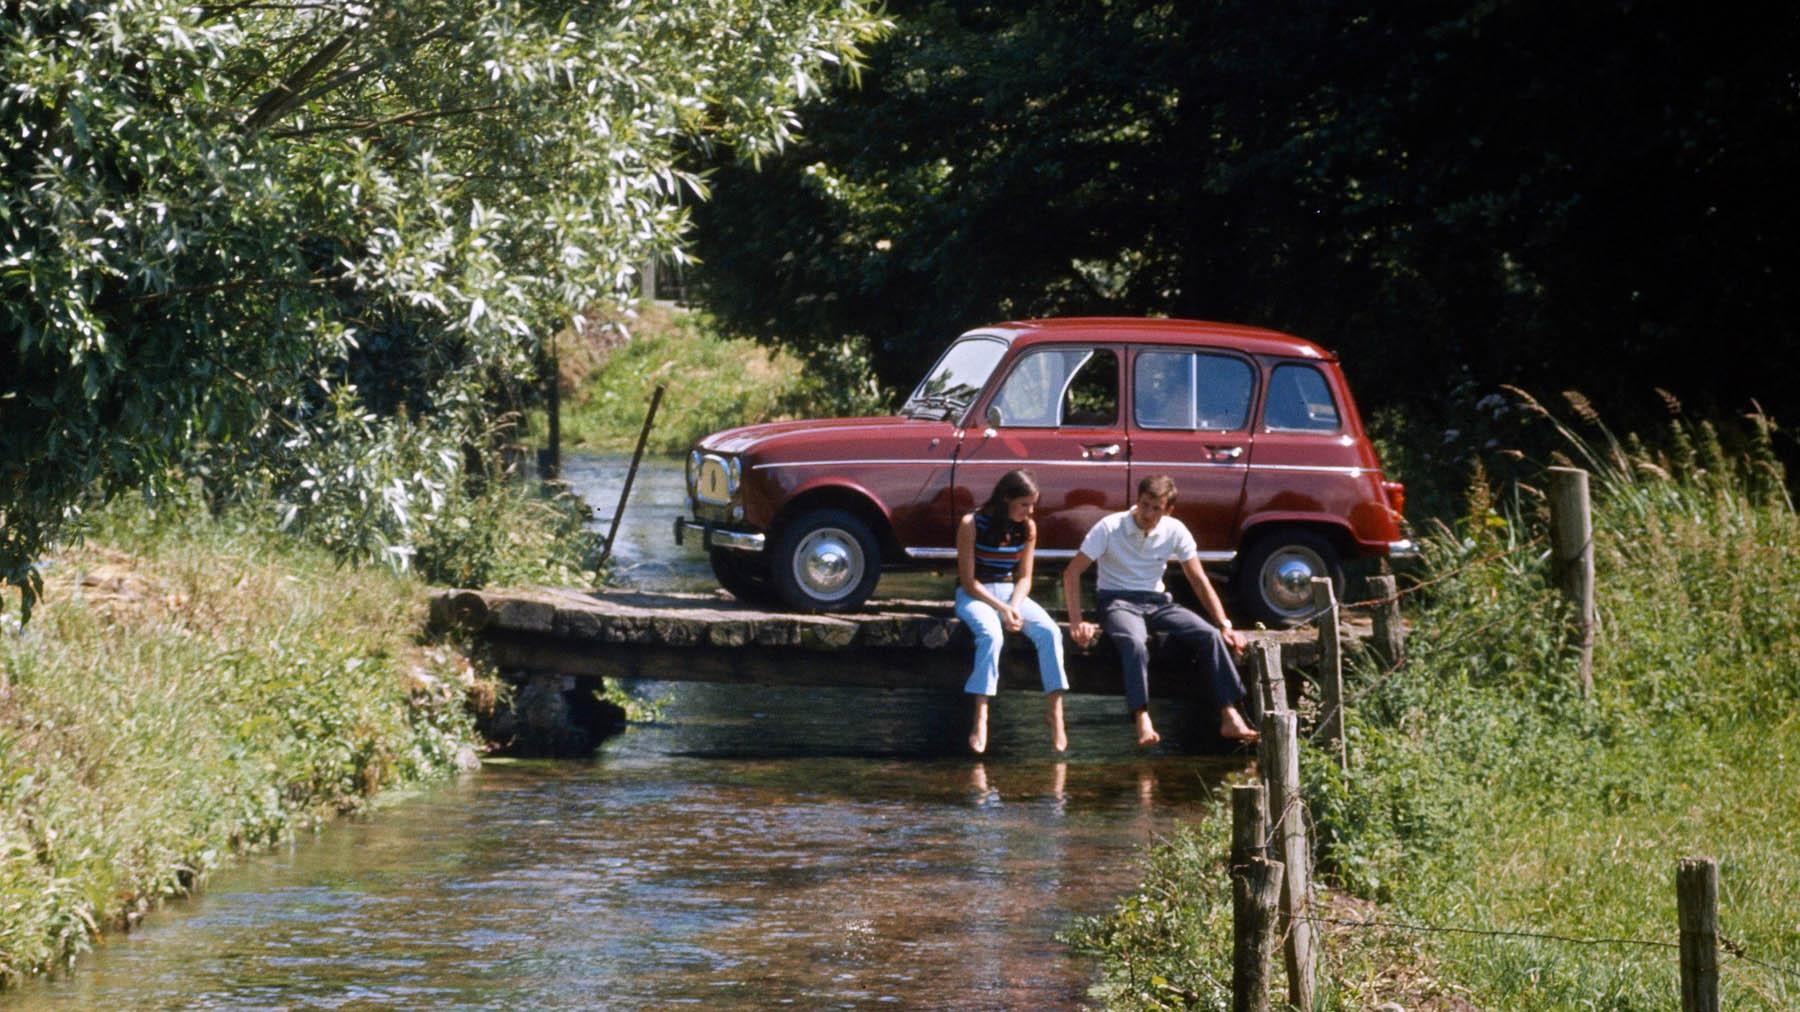 21207141 1961 Renault 4 Copy